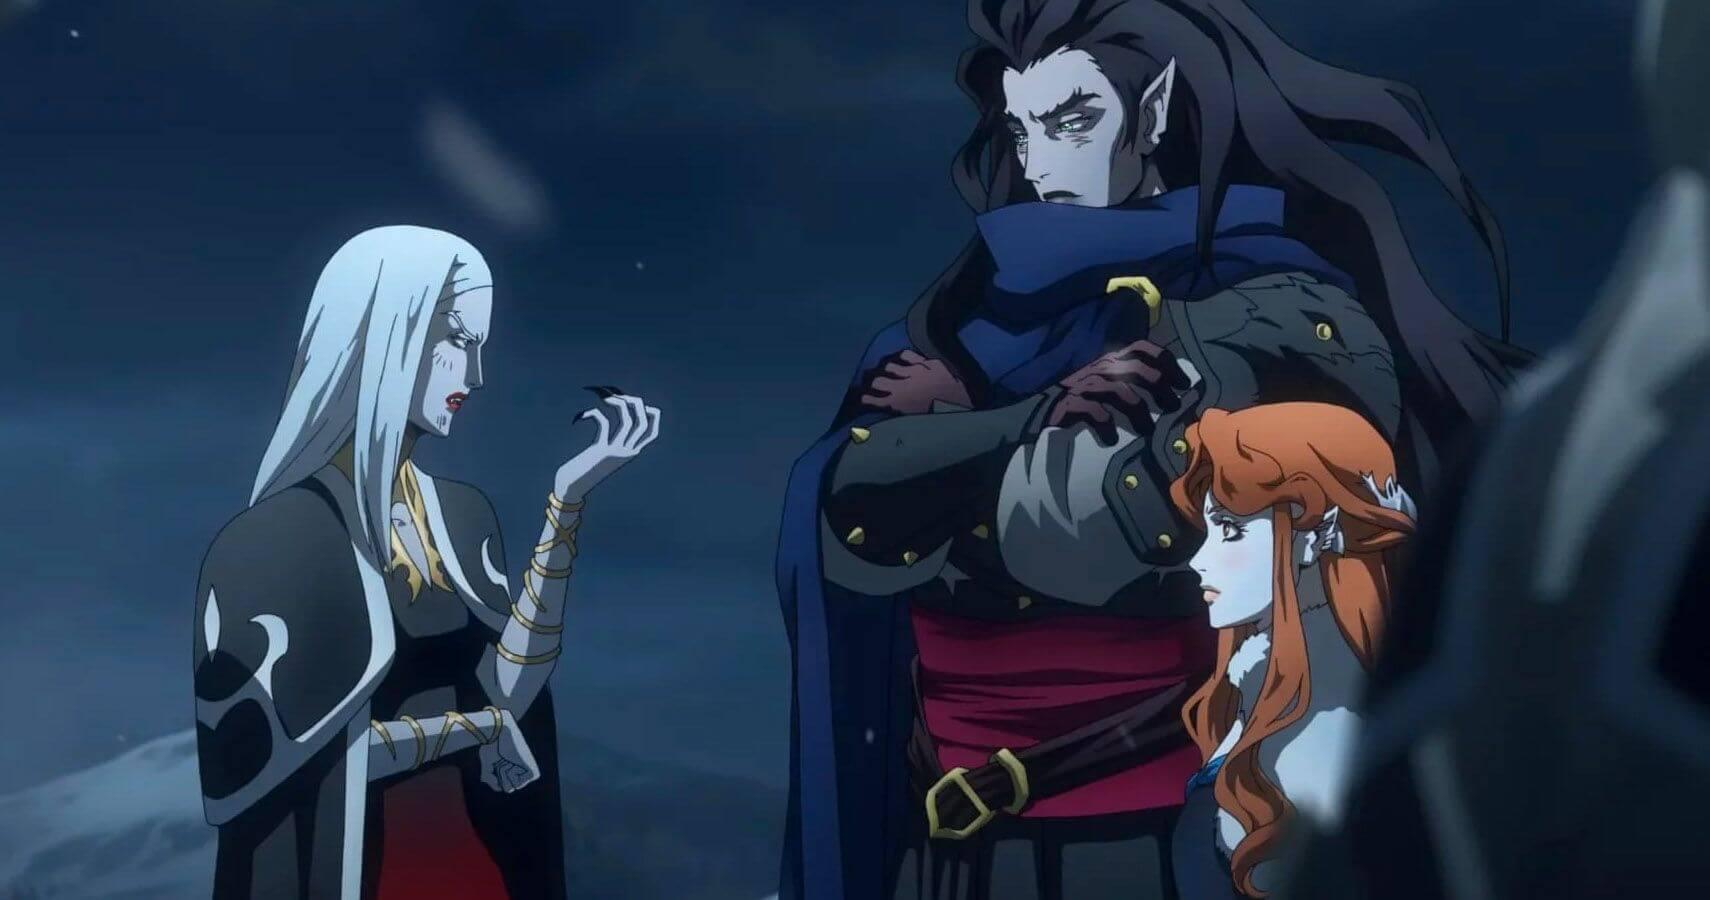 Castlevania vampire sisters